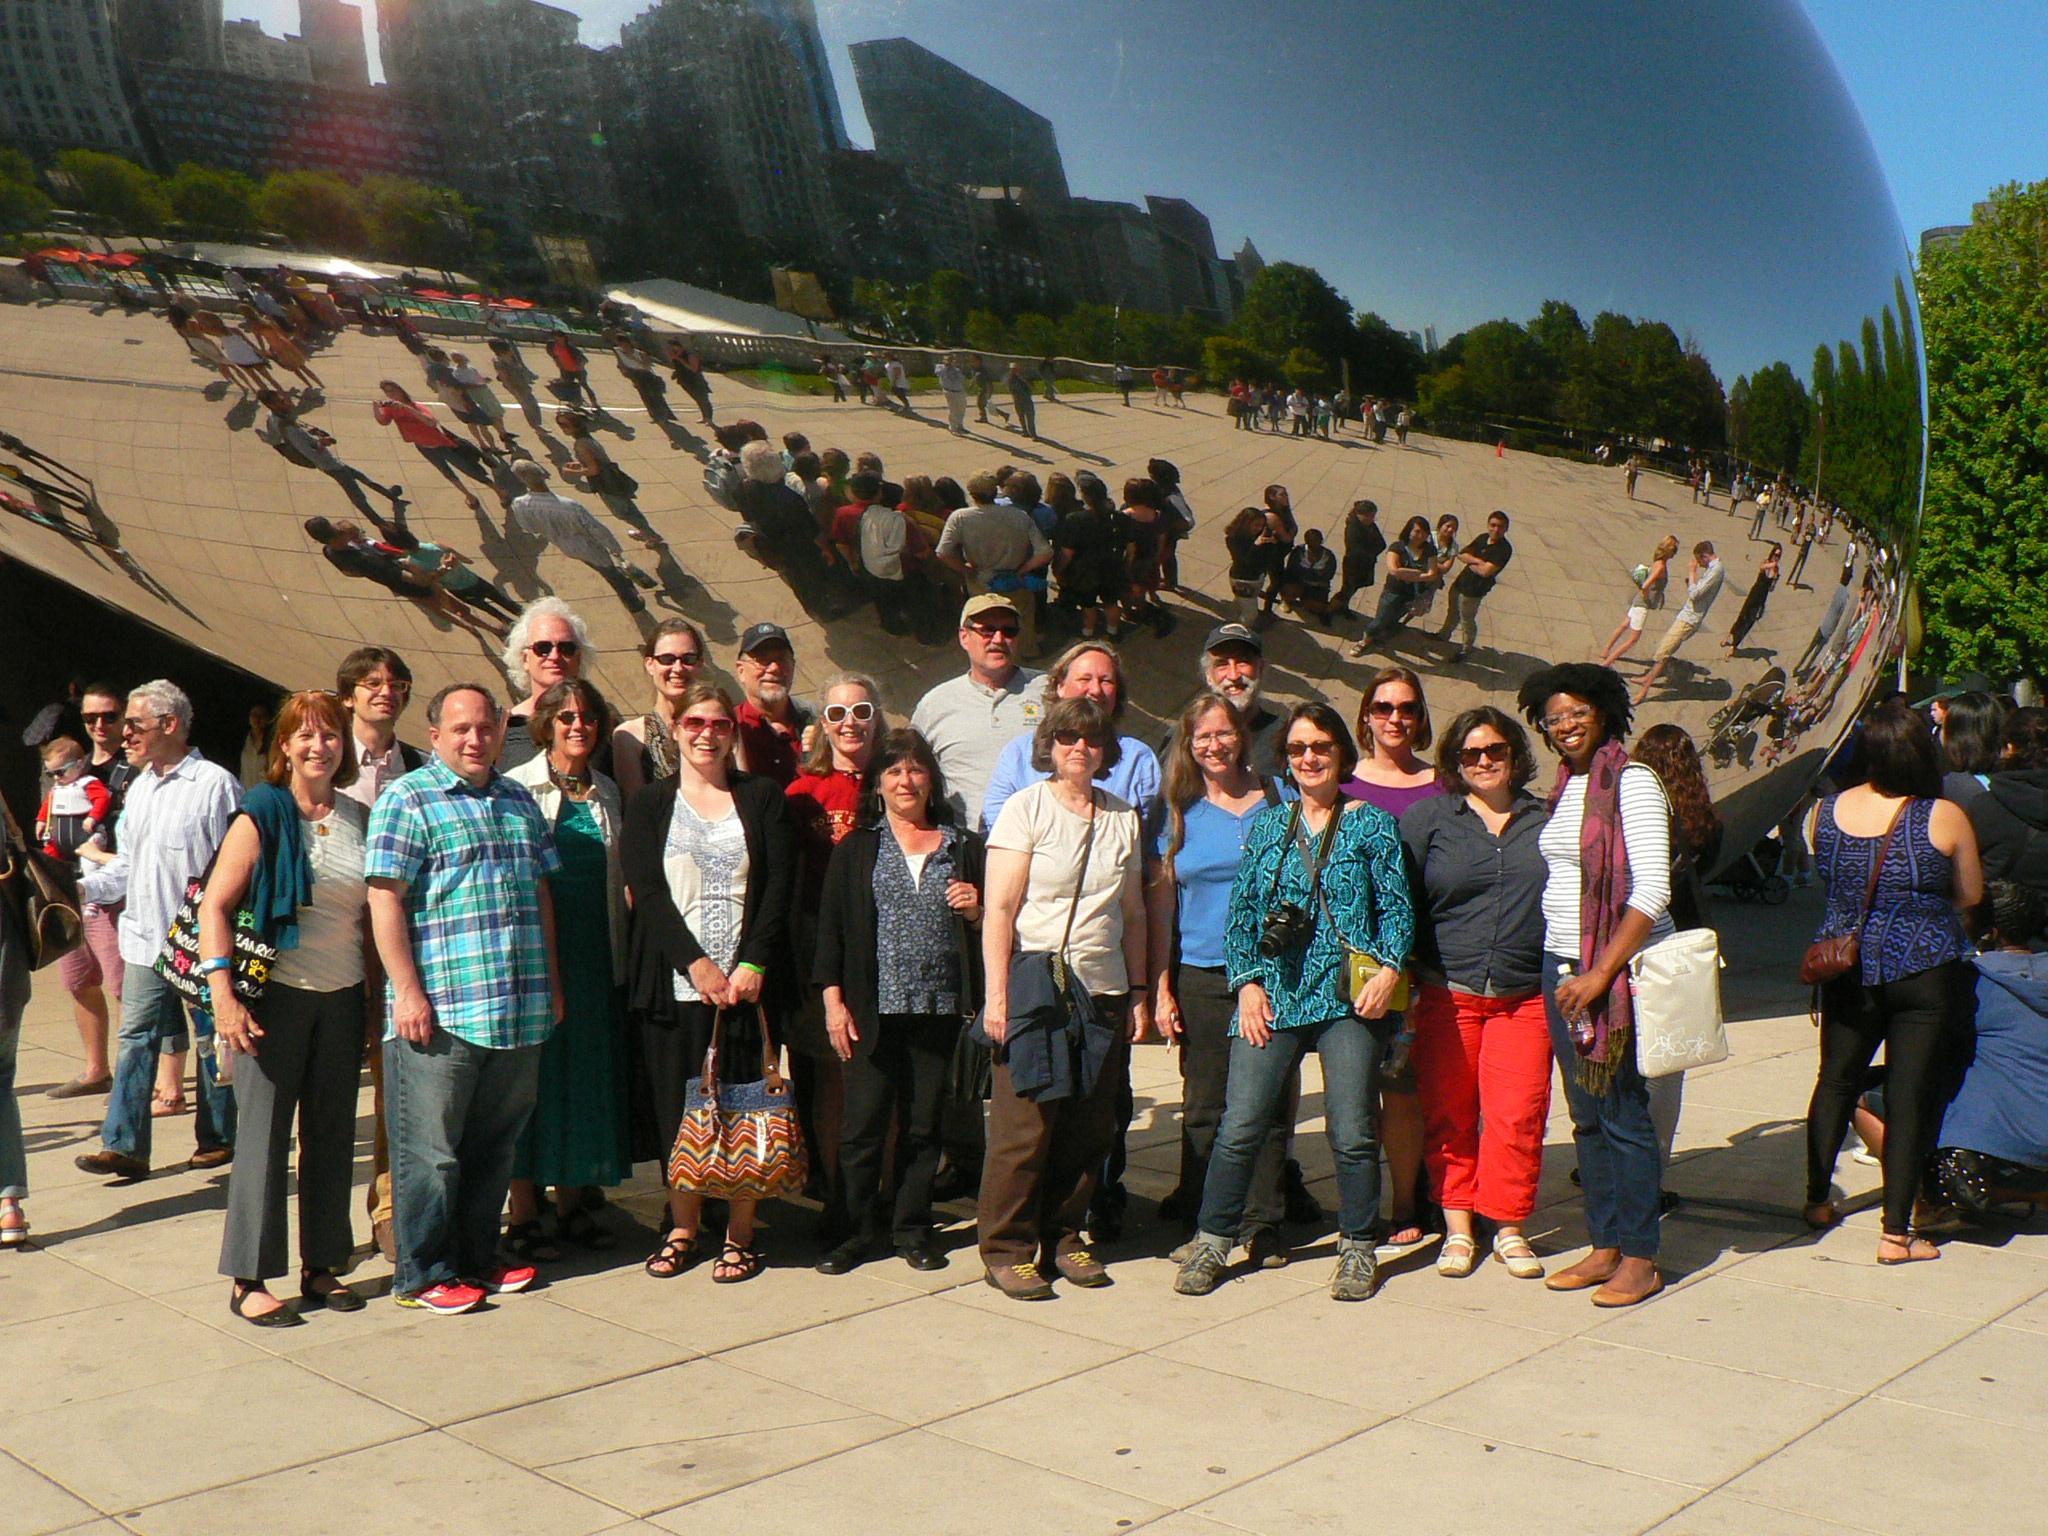 Midwest Folk Retreat 2014, Chicago, IL